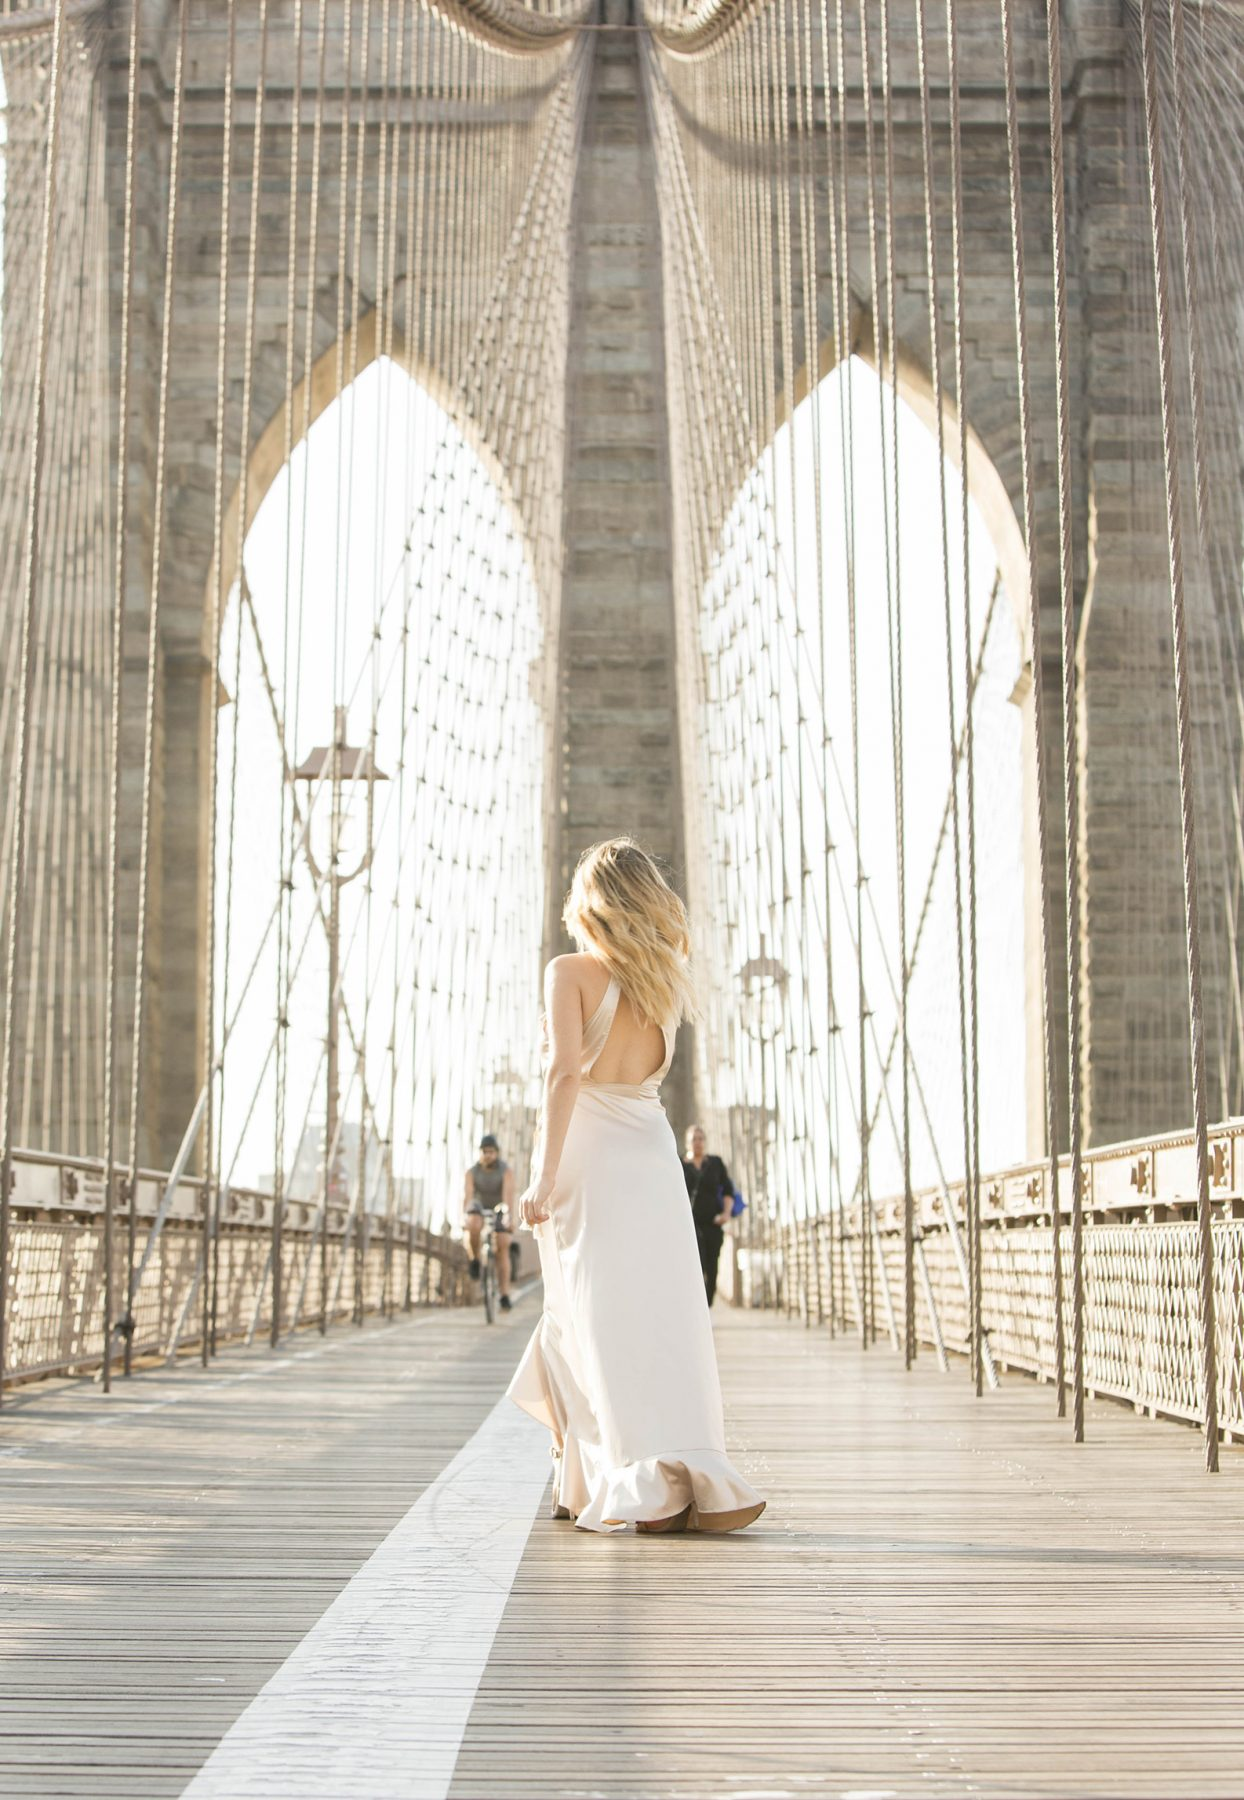 Brooklyn Bridge fashion blogger photo shoot Shenska